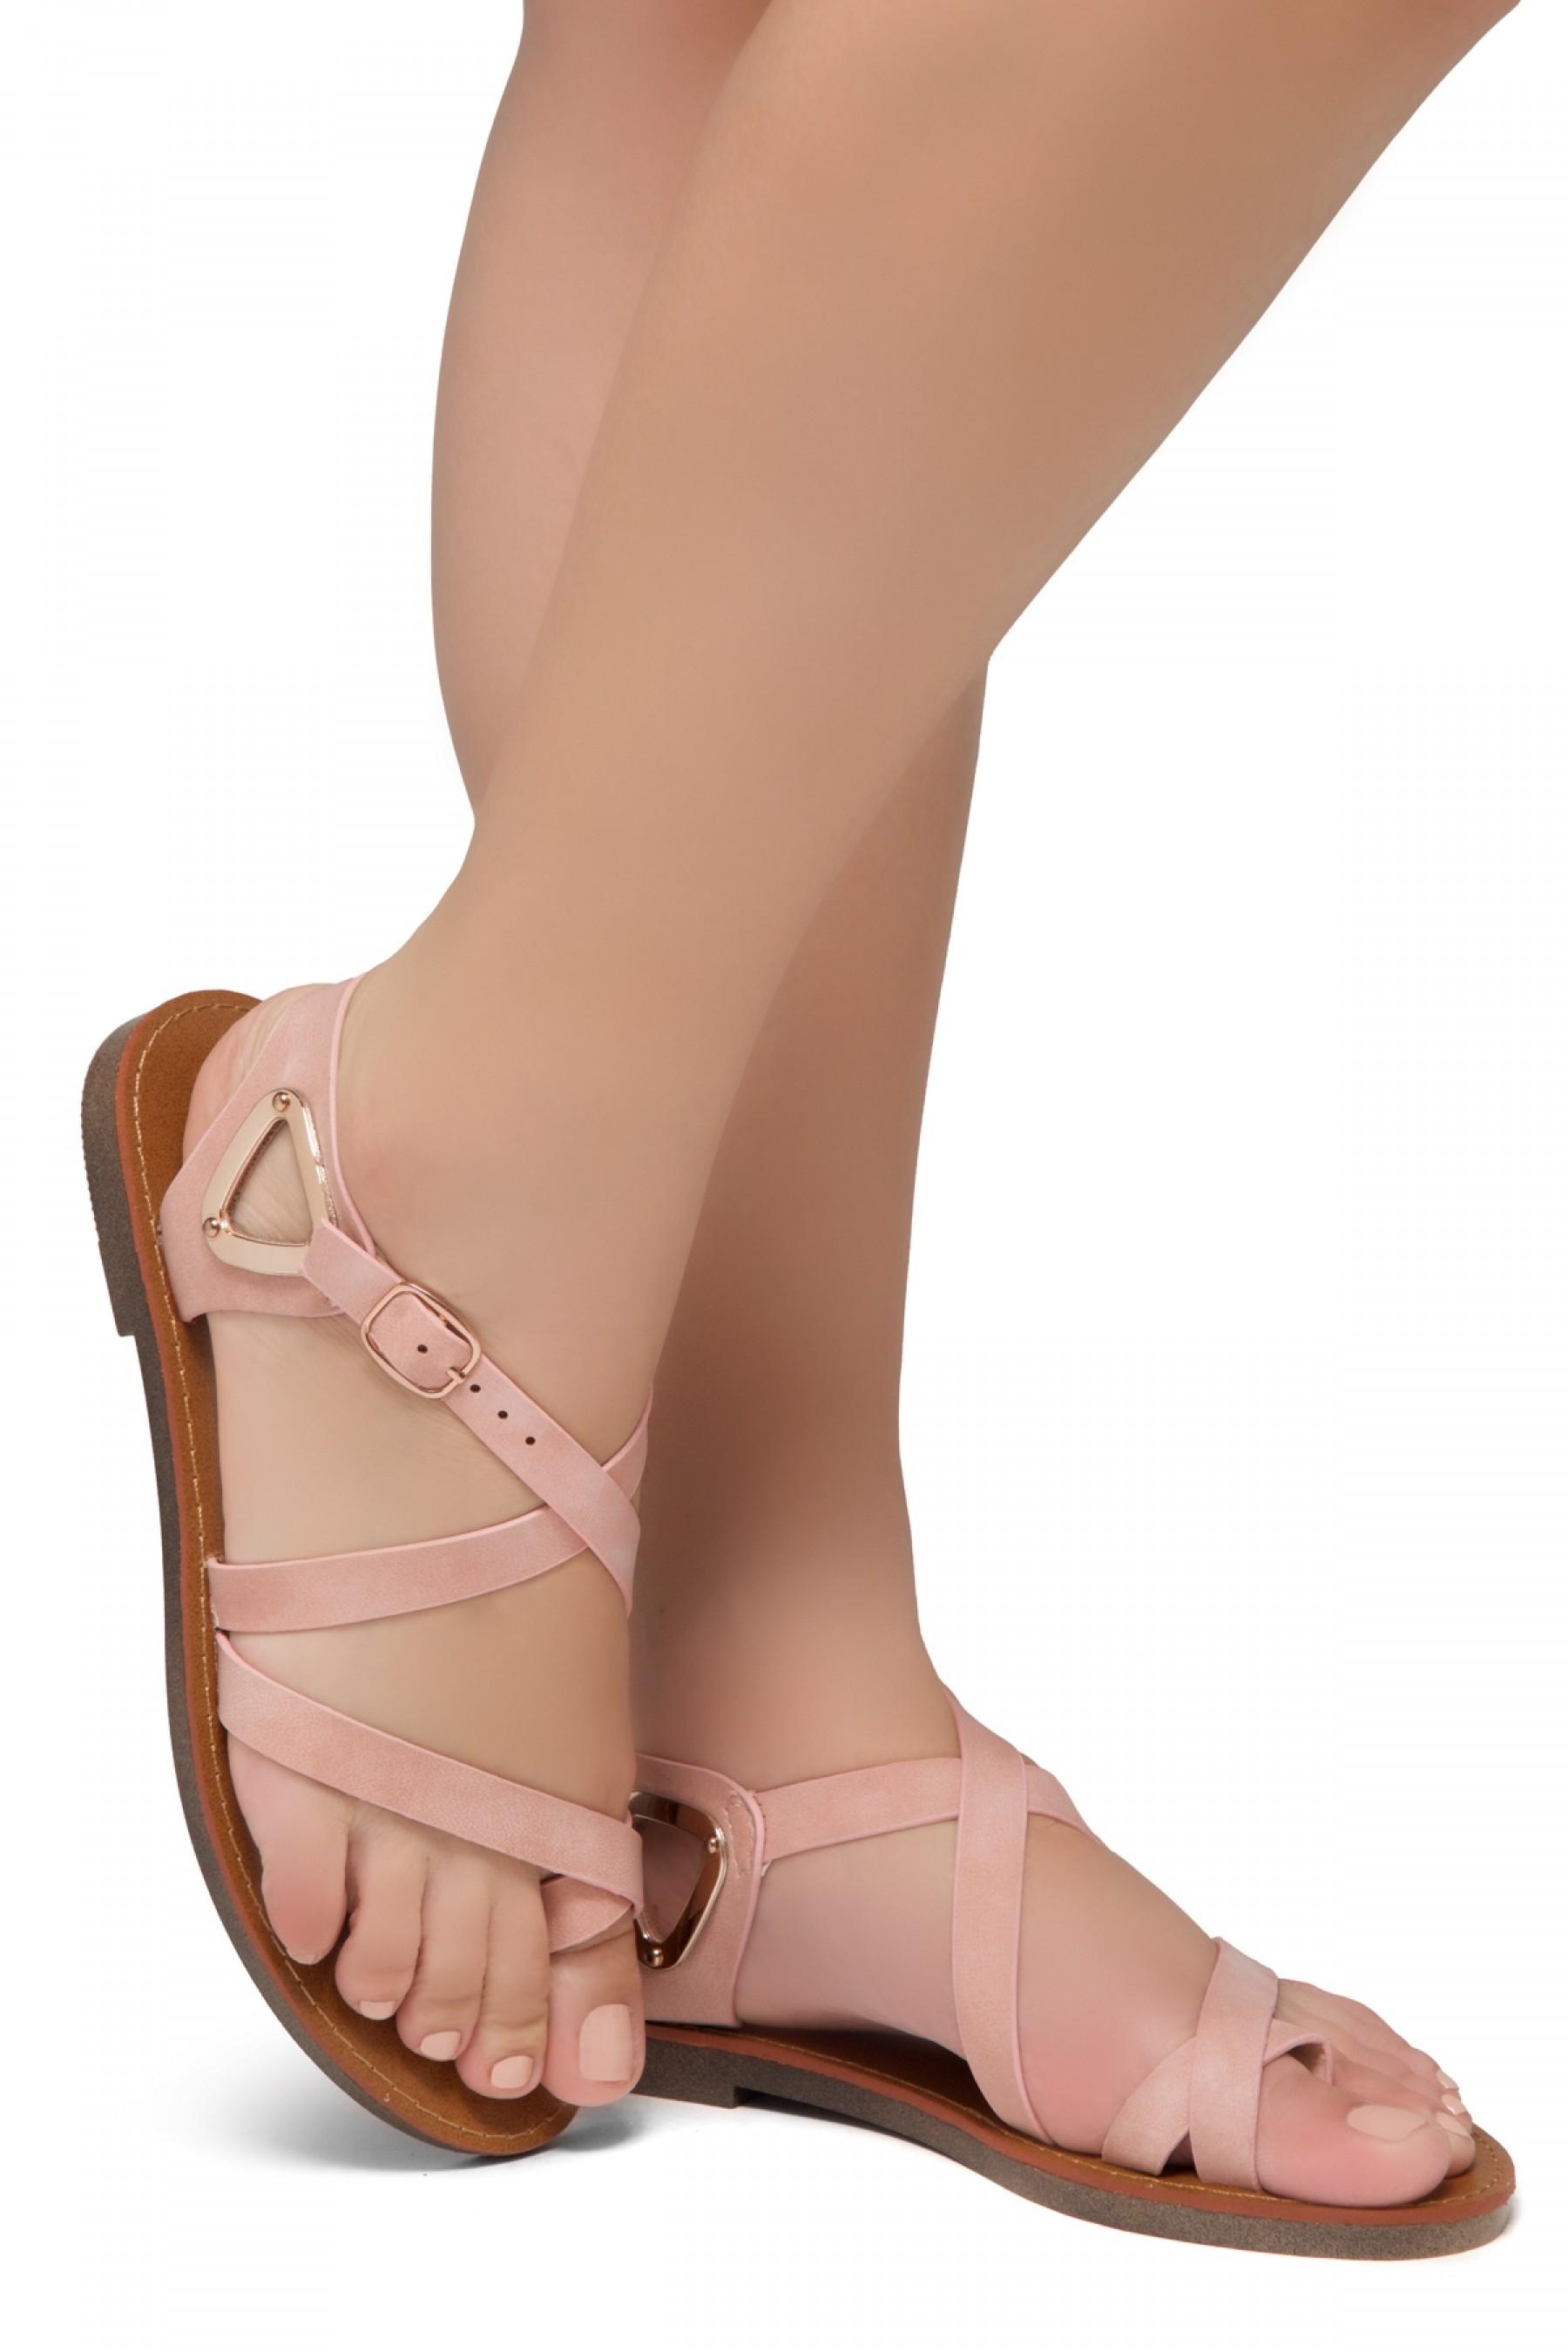 Shoe Land Needed-Women's Open Toe Flat Gladiator Sandals (Mauve)